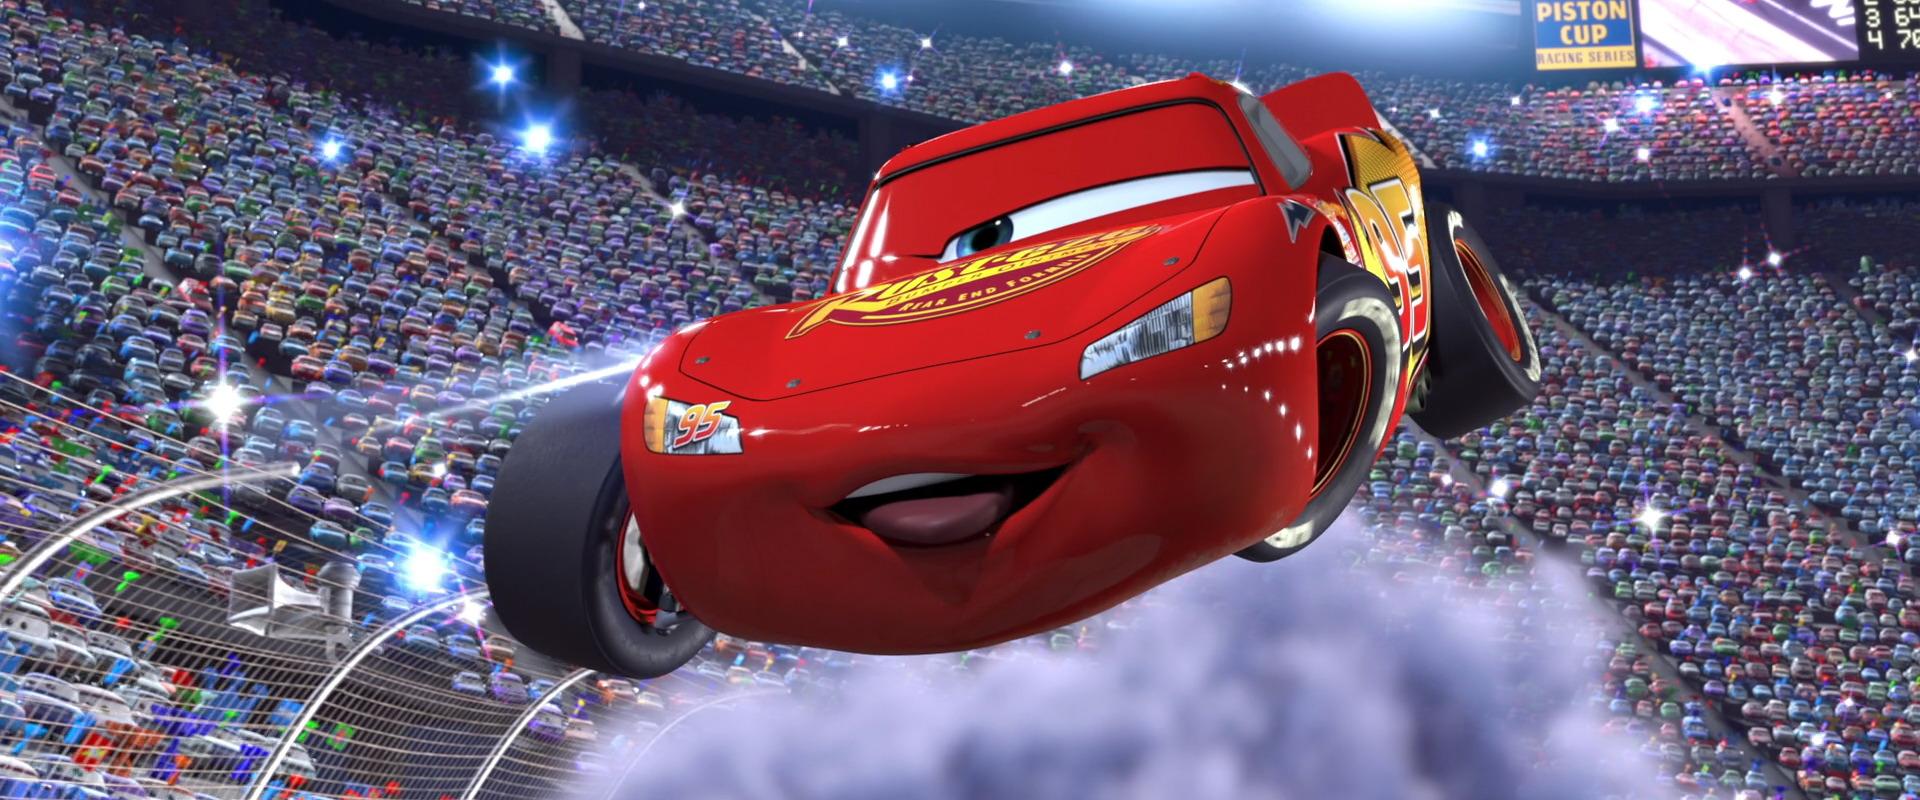 Lightning mcqueen character from cars pixar planet fr - Image de flash mcqueen ...